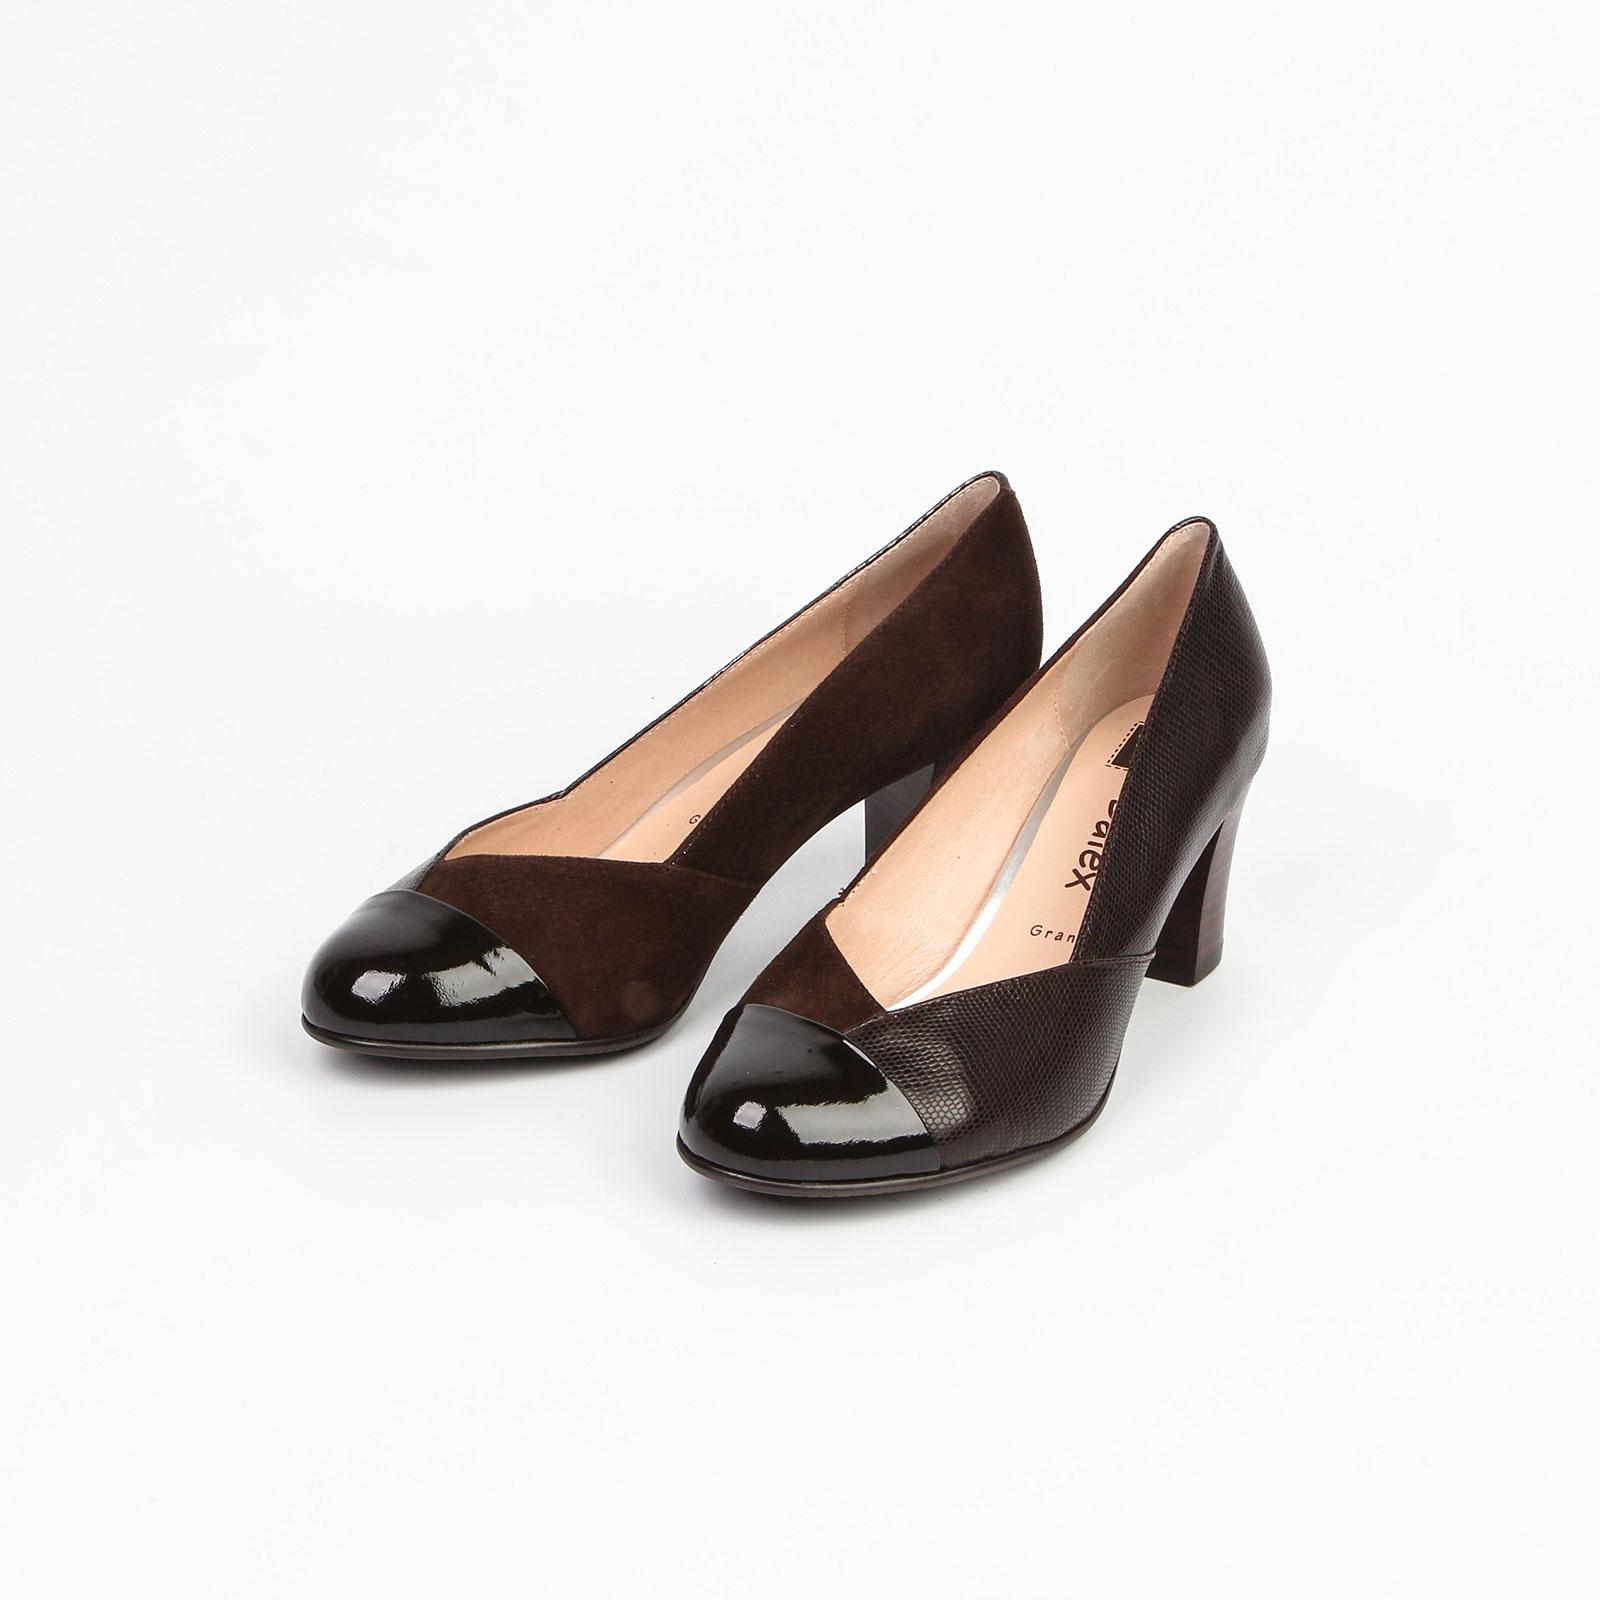 Женские туфли на среднем каблуке